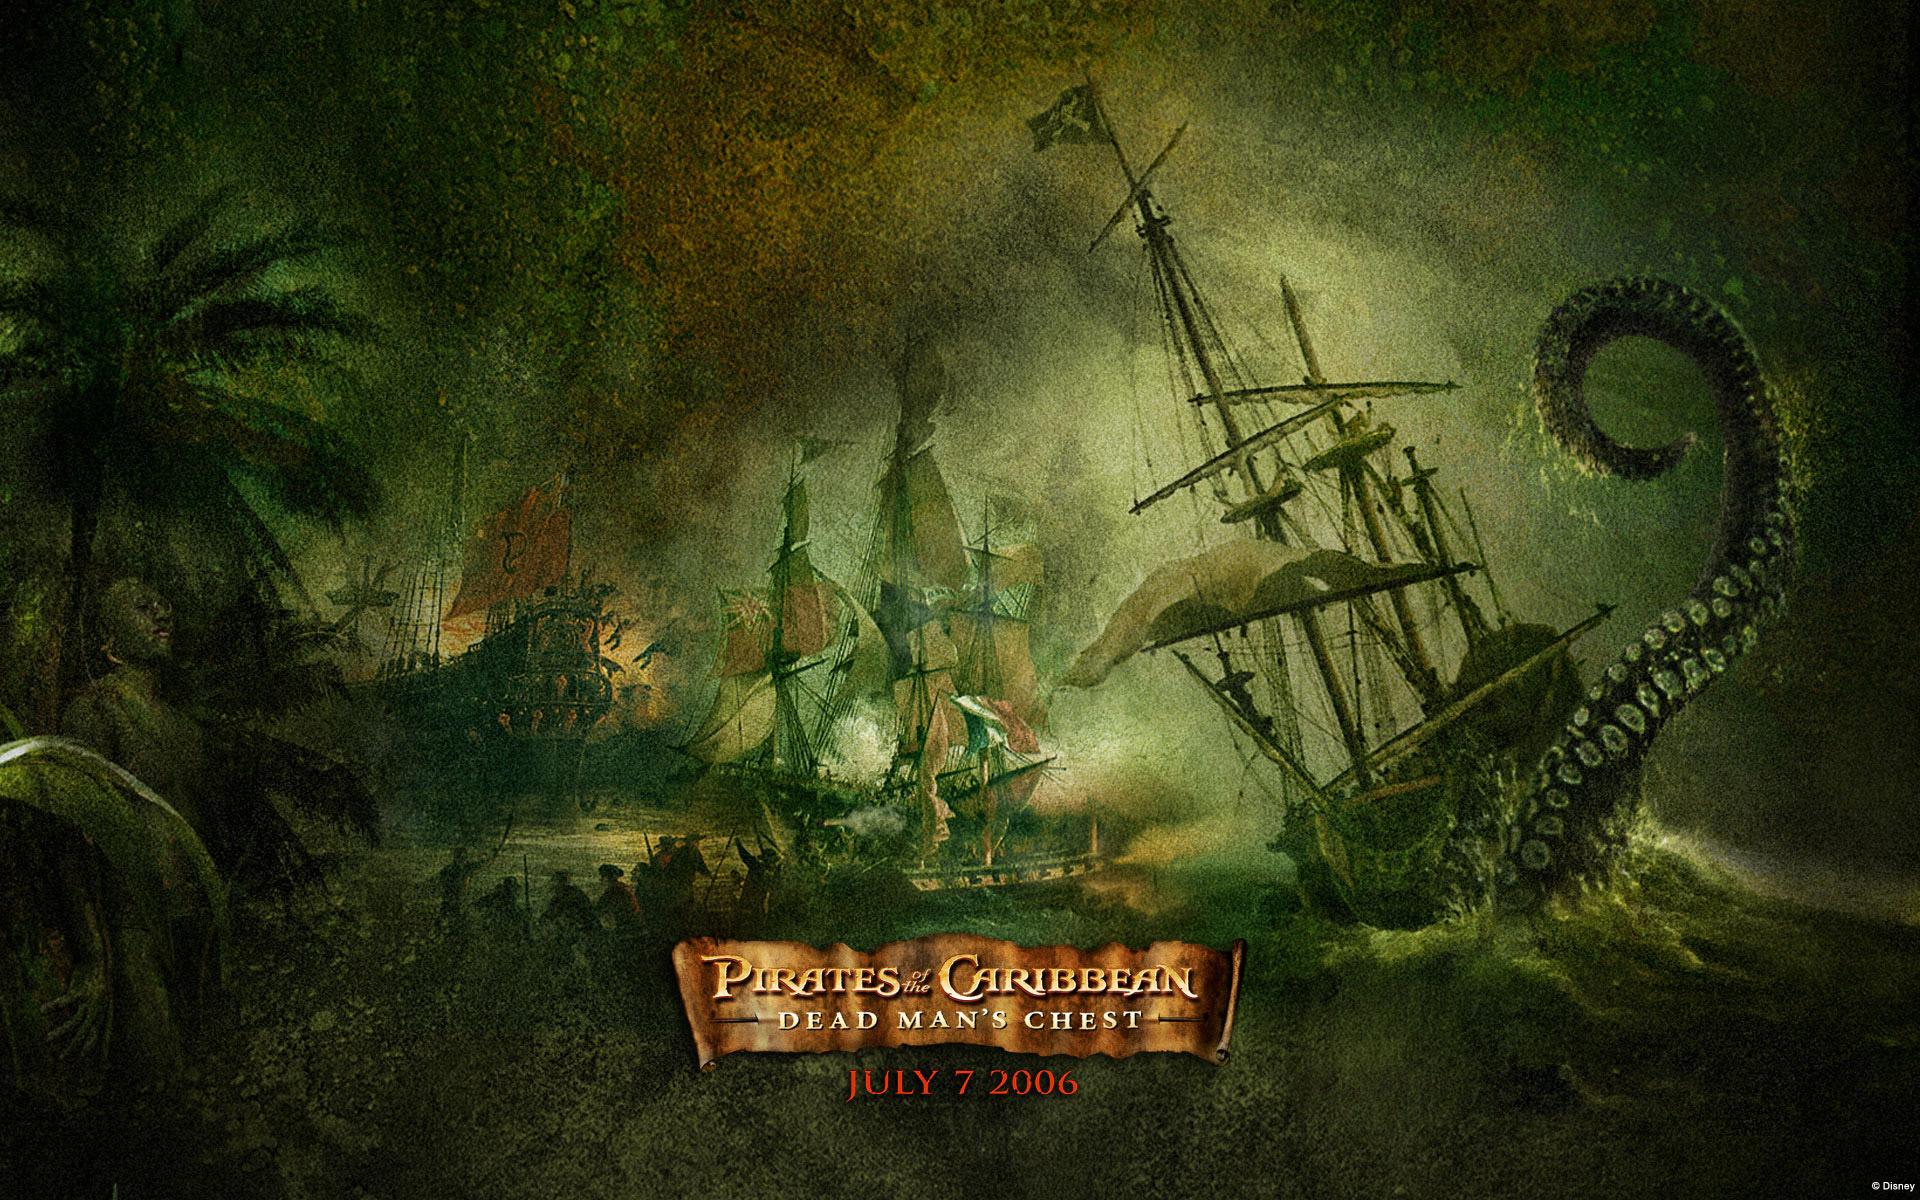 pirates of the caribbean 832173 wallpaper wallpaper